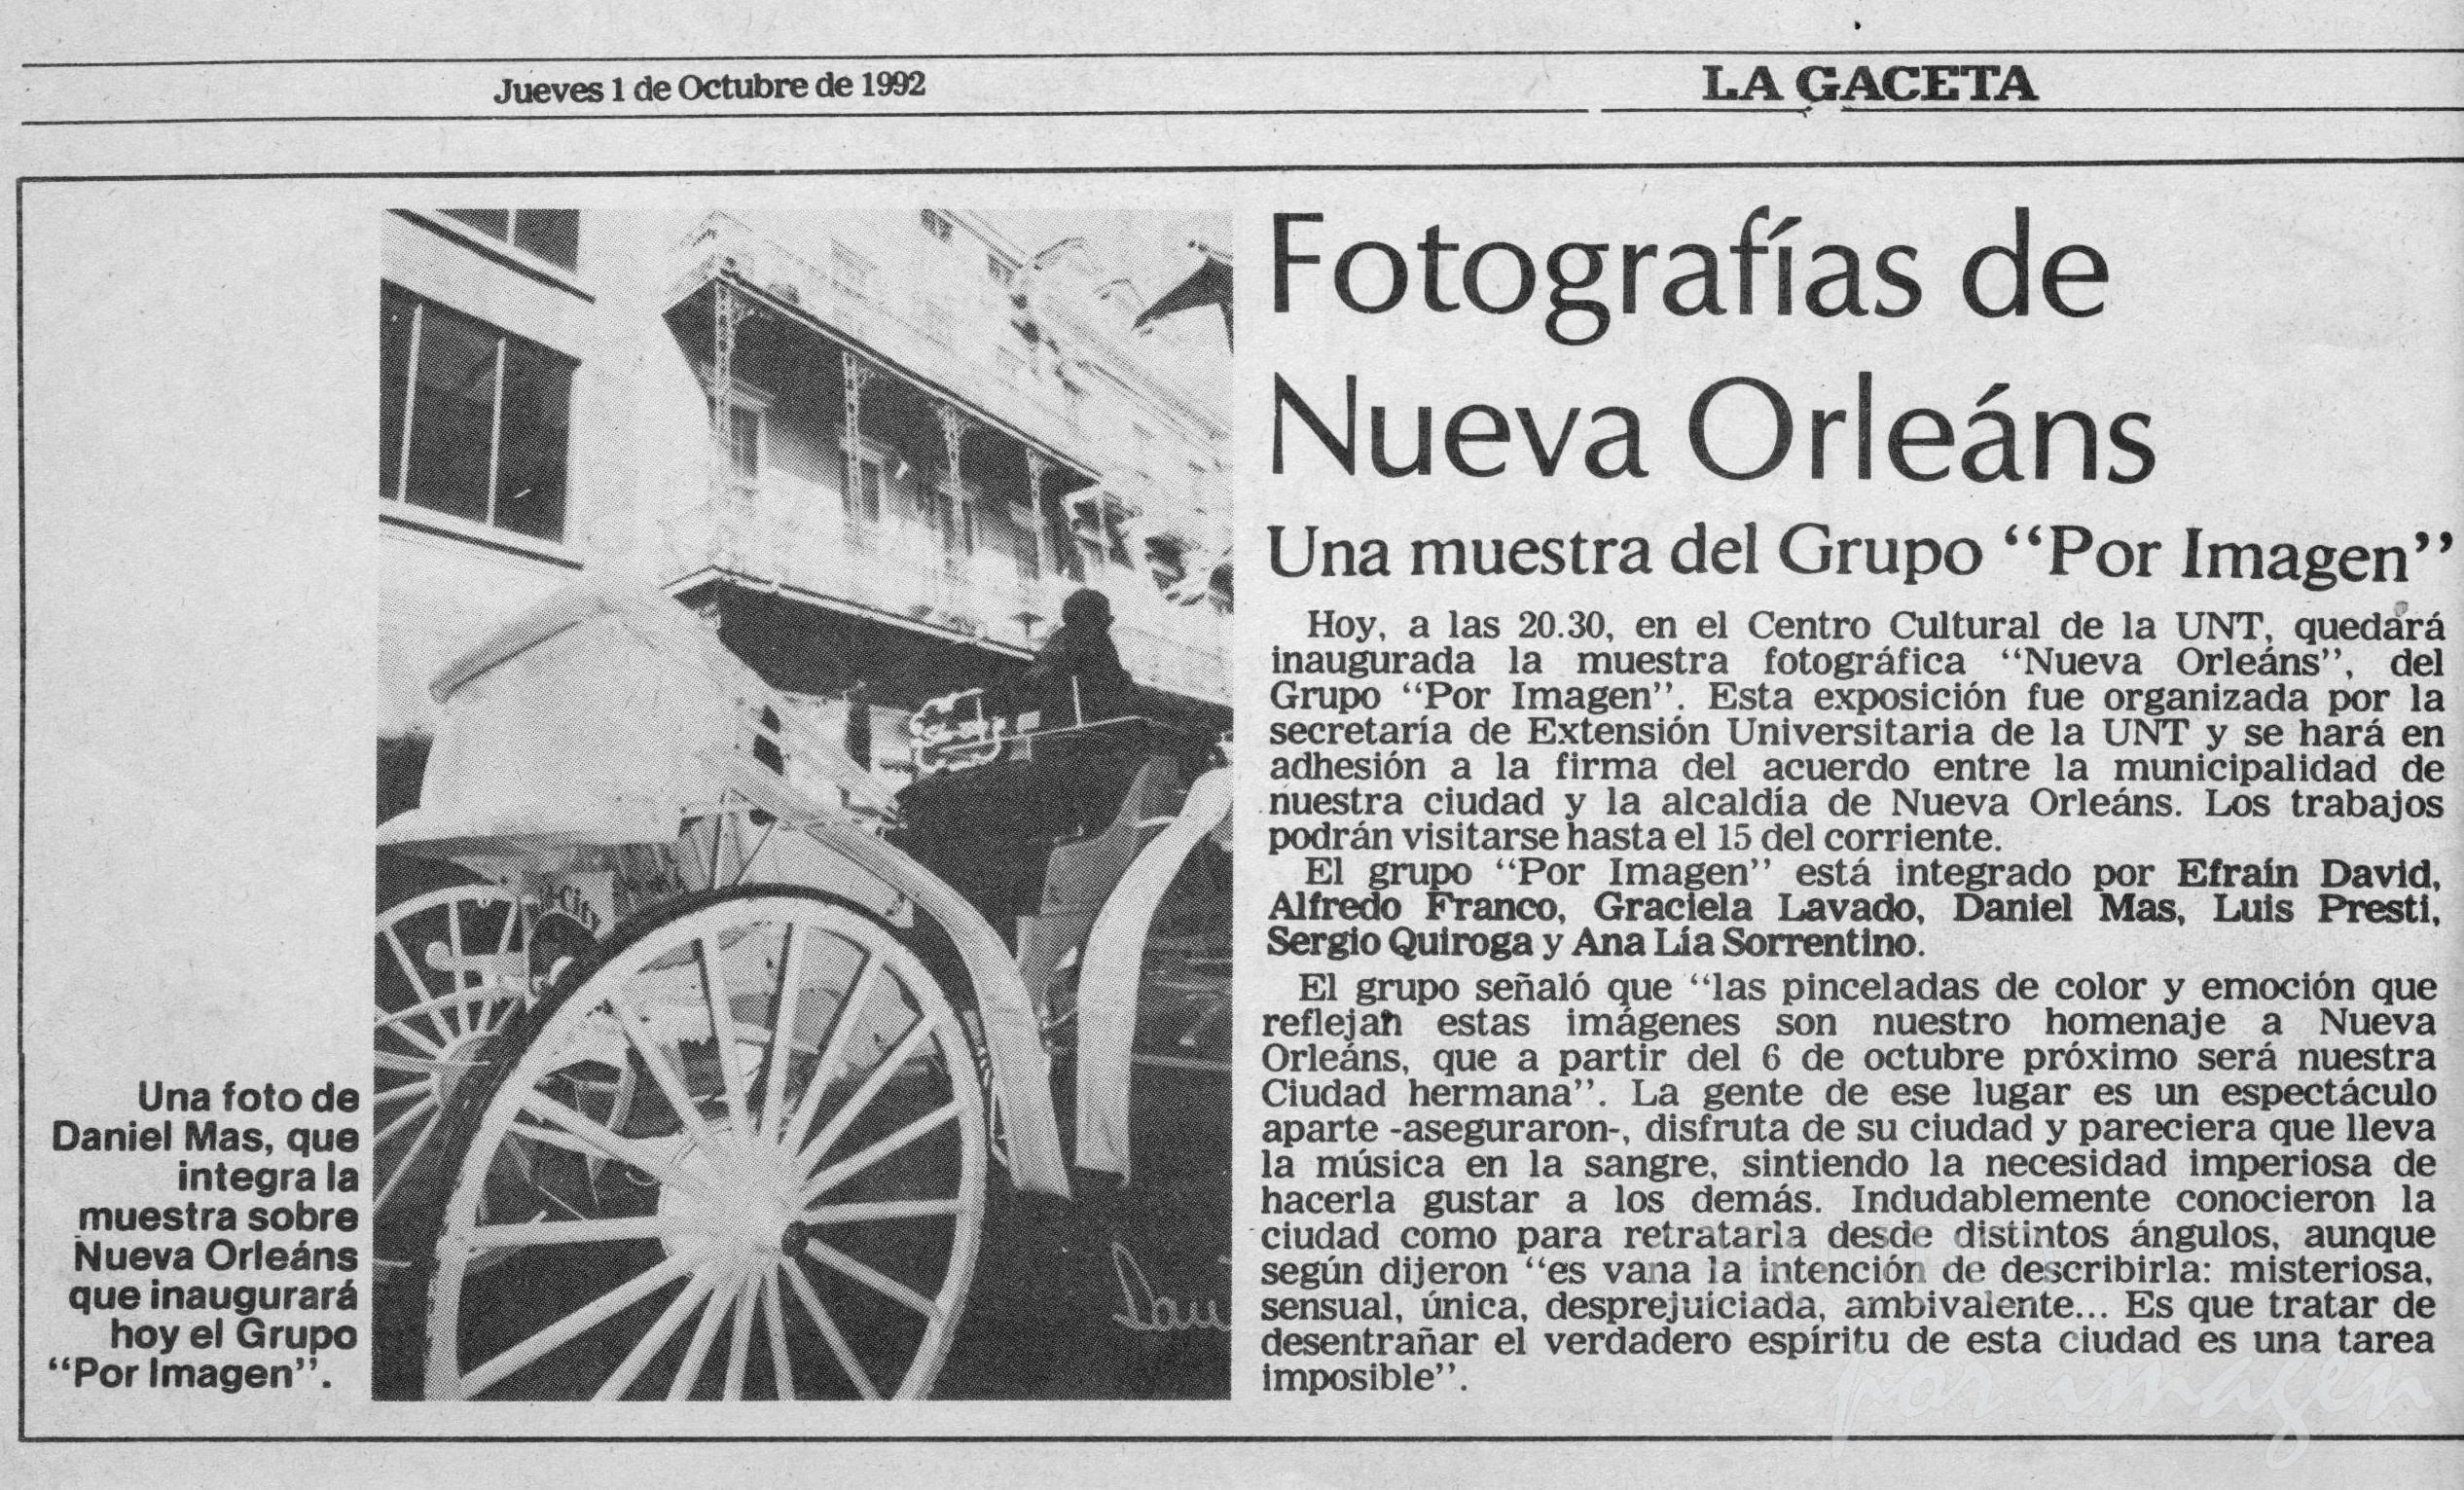 «New Orleans & Grupo por Imagen»